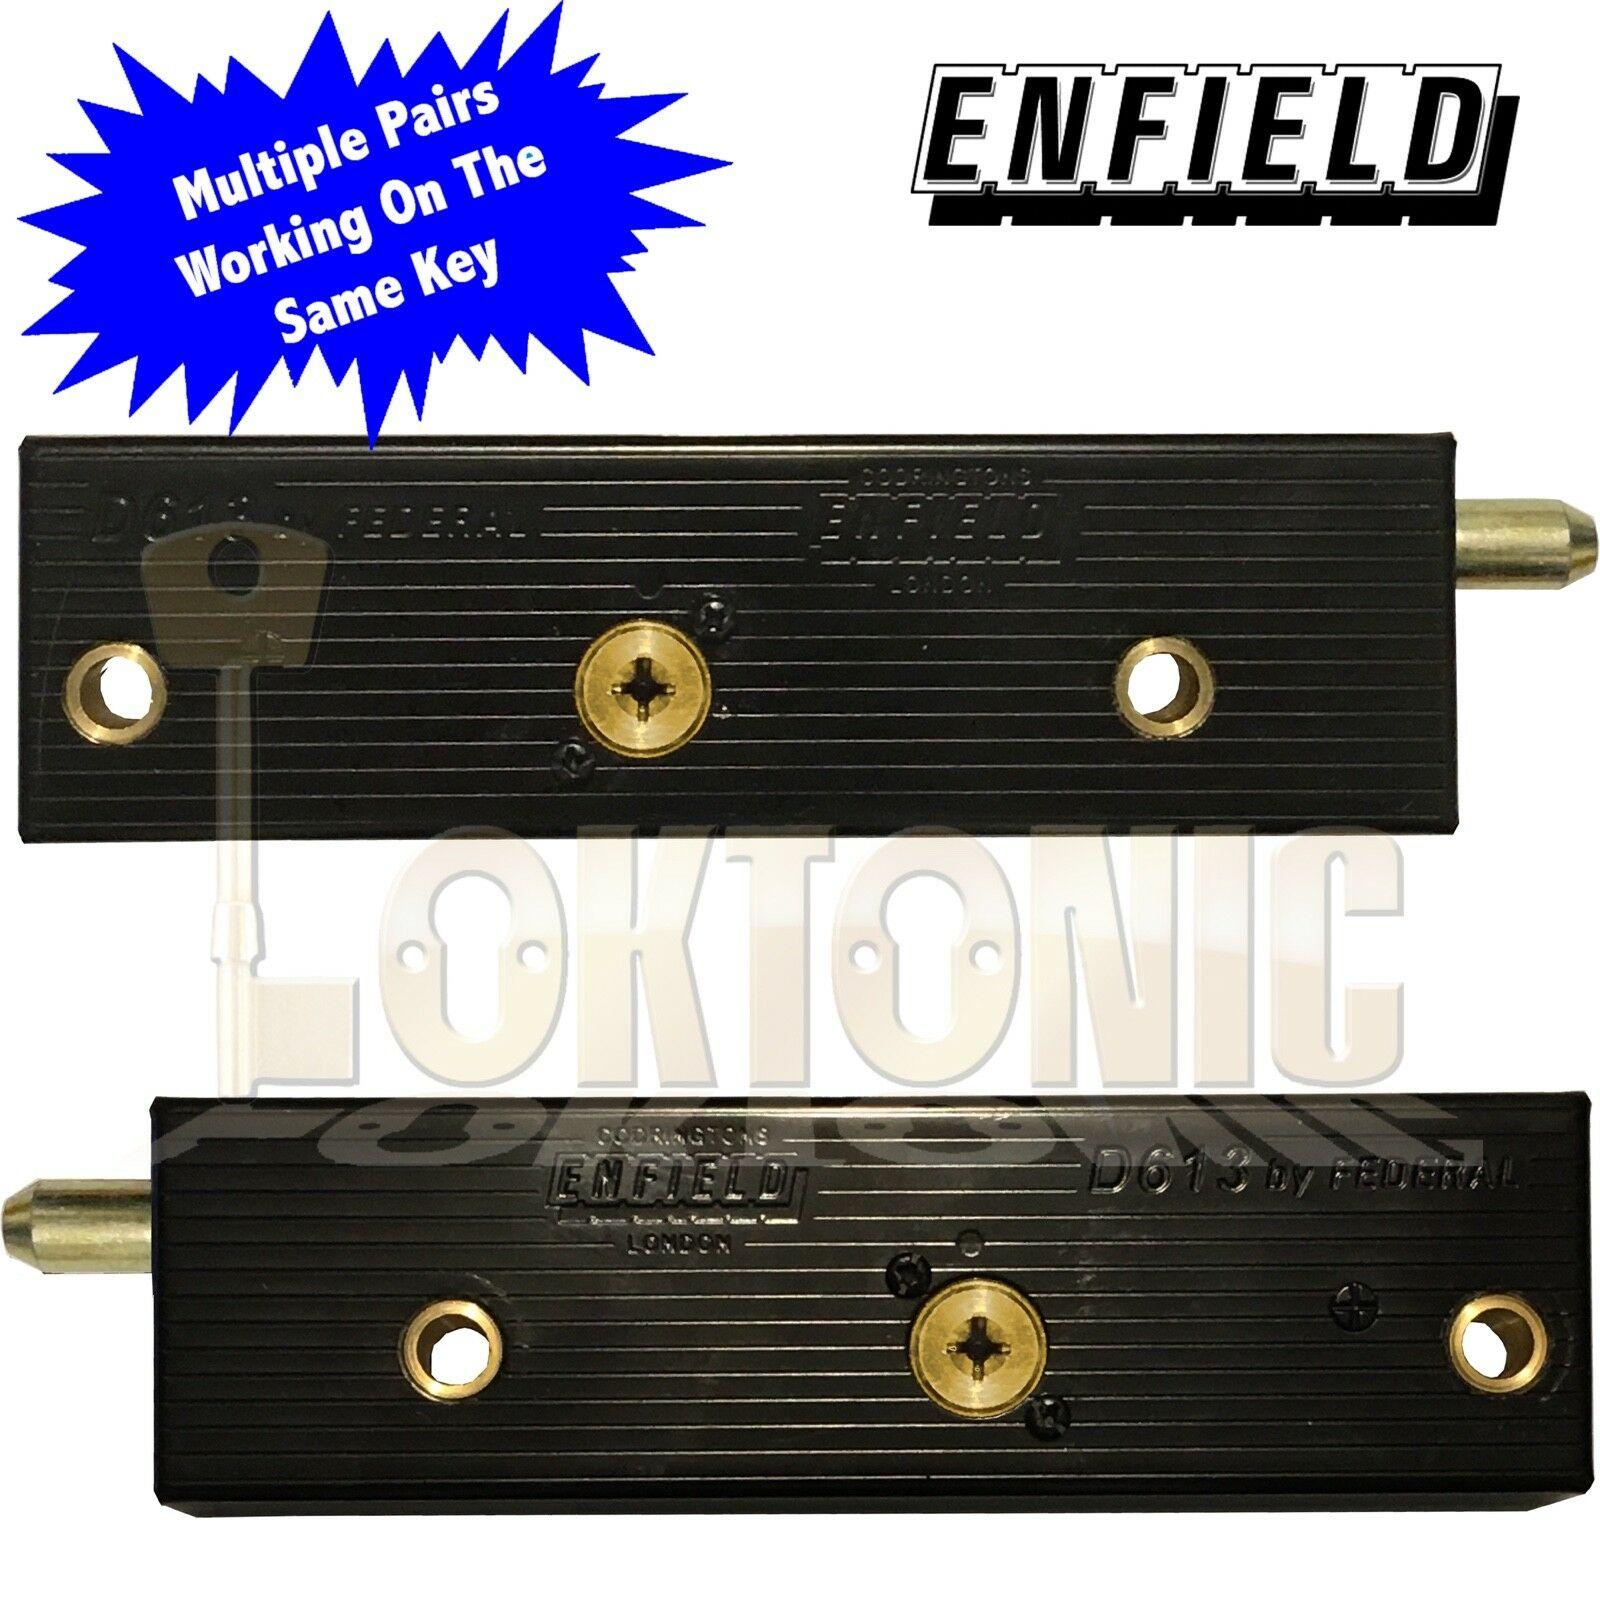 Enfield D613 Garage Door Bolts Locks Multiple Pairs All